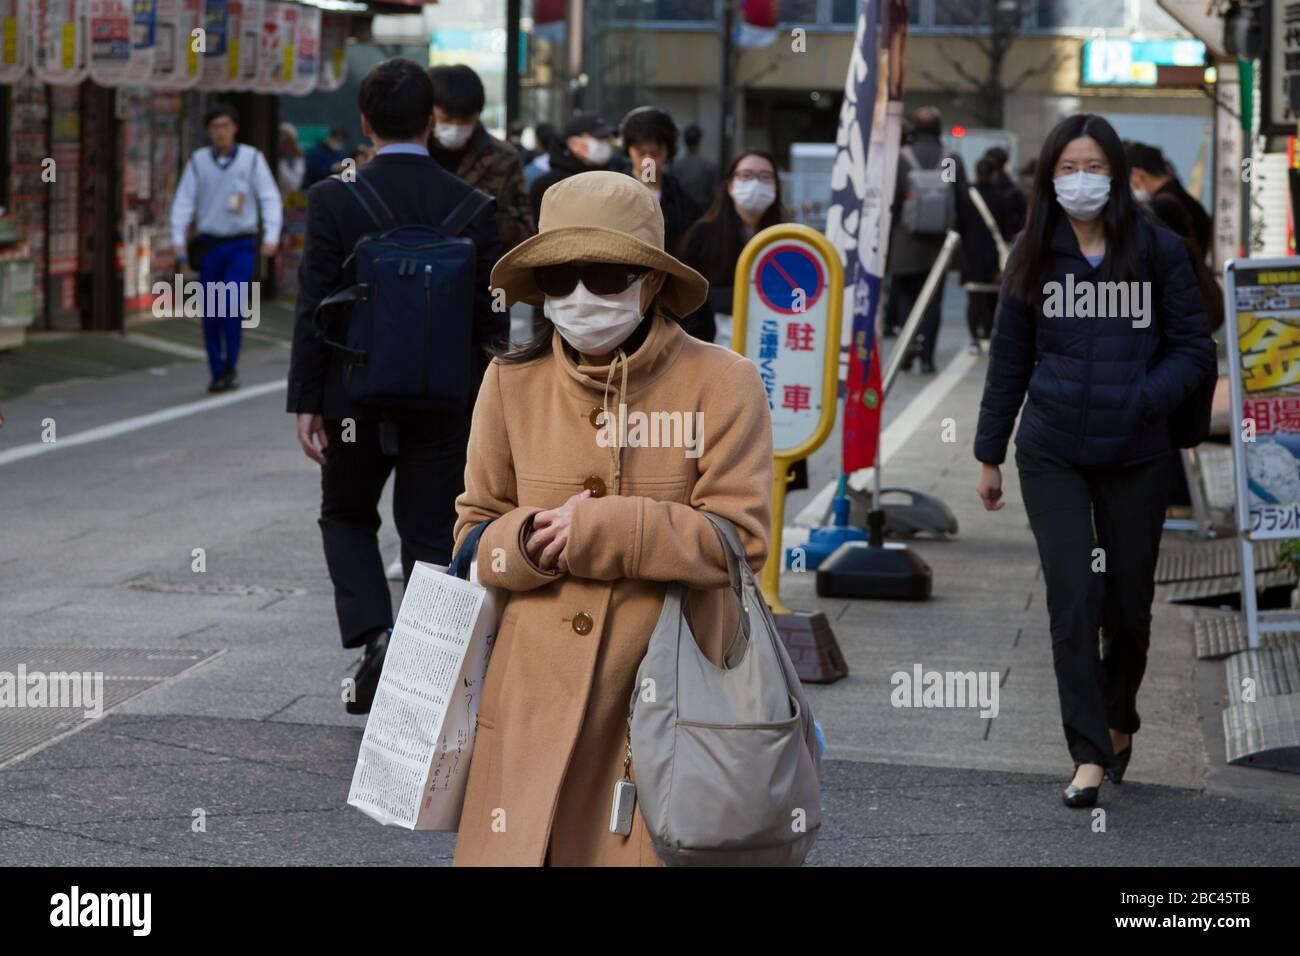 People wearing surgical masks to avoid diseases like the COVID-19 Corona Virus  in Shinjuku, Tokyo, Japan, Thursday February 27th 2020 Stock Photo